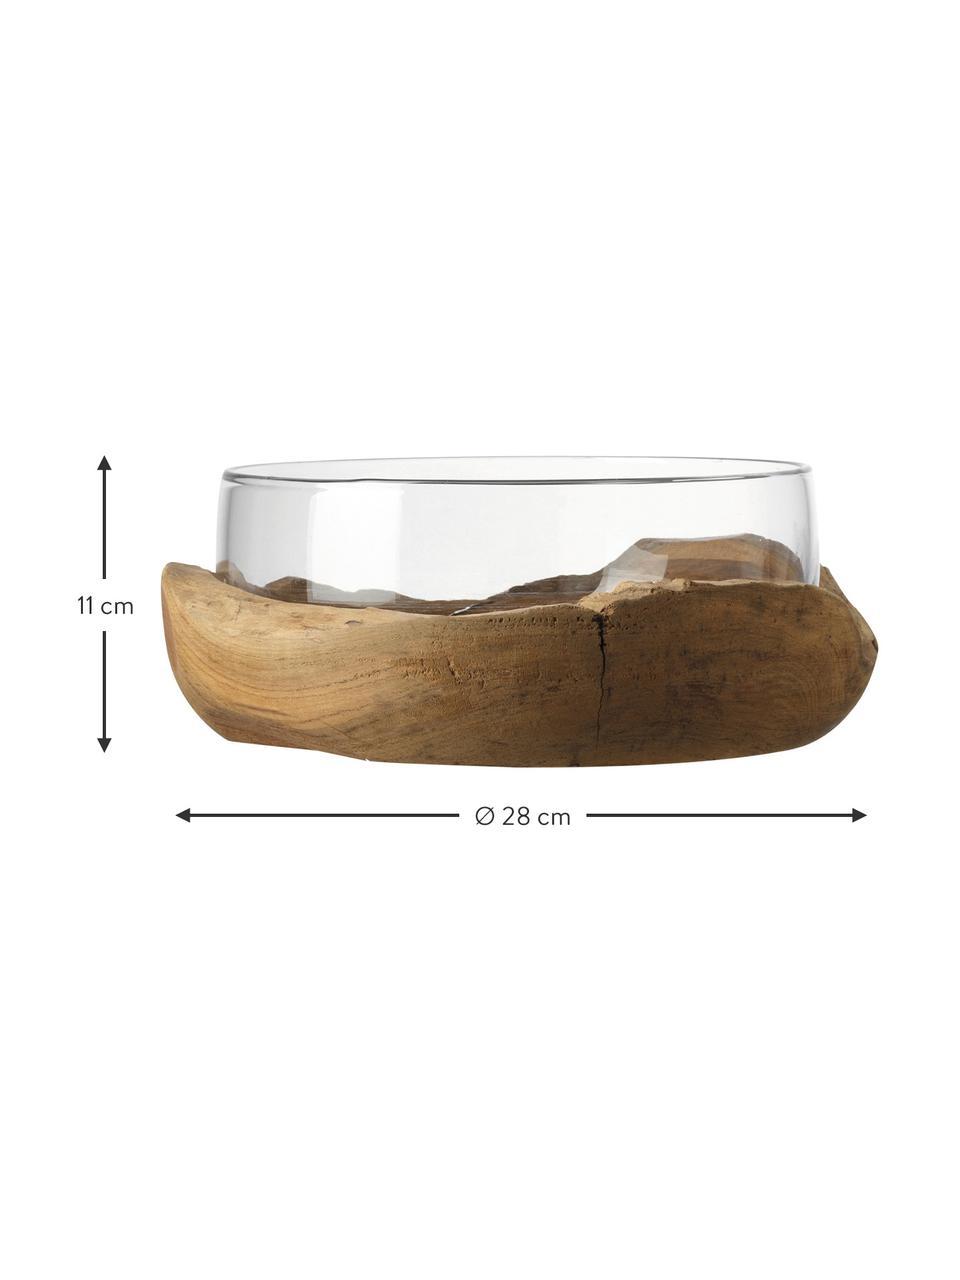 Handgefertigte Deko-Schale Terra mit Teaksockel, Sockel: Teakholz, Transparent, Ø 28 x H 11 cm